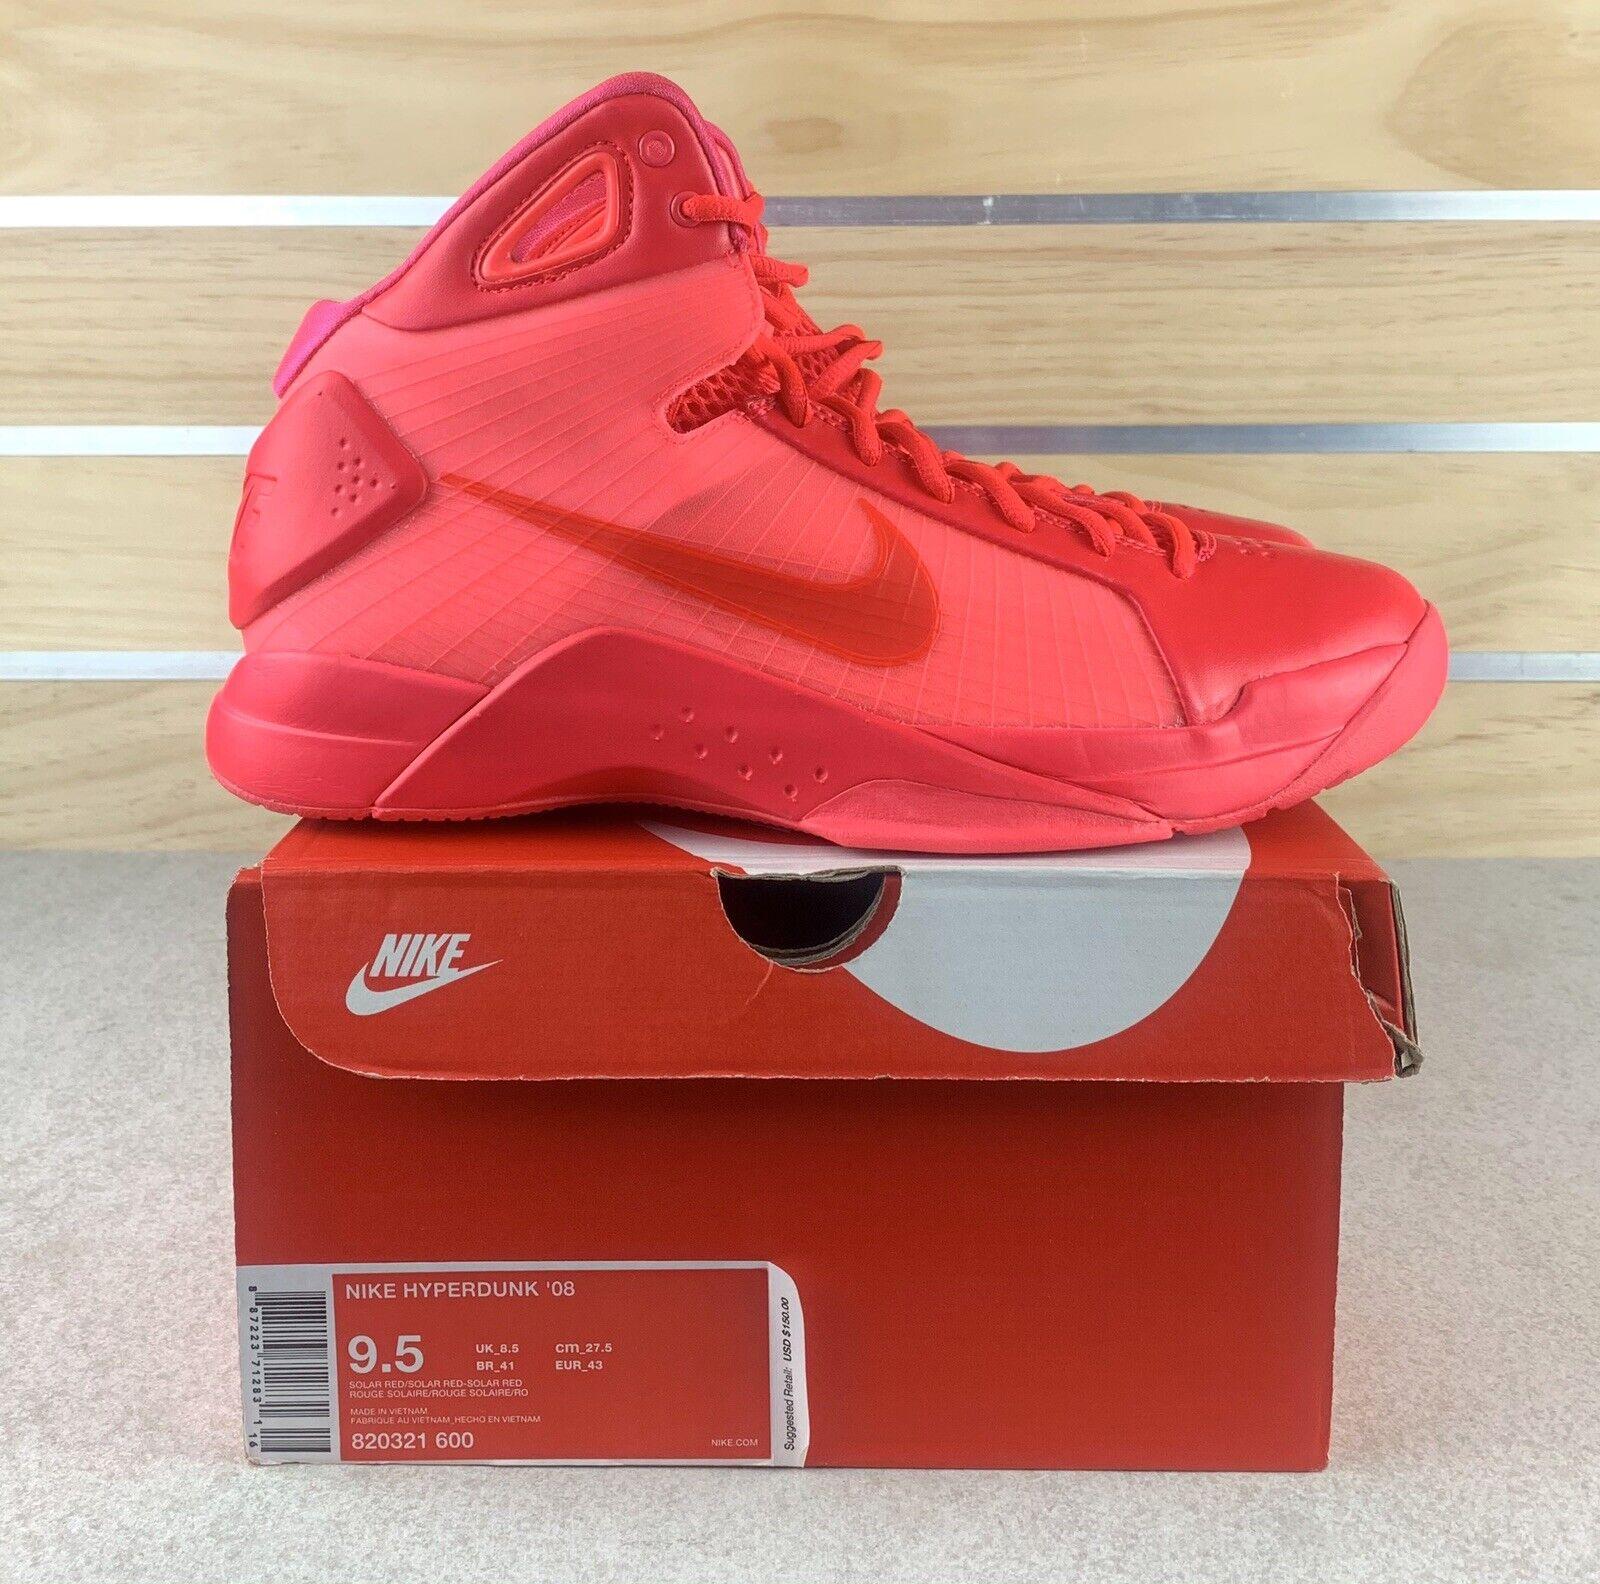 Nike Hyperdunk 08 Retro Solar Red New